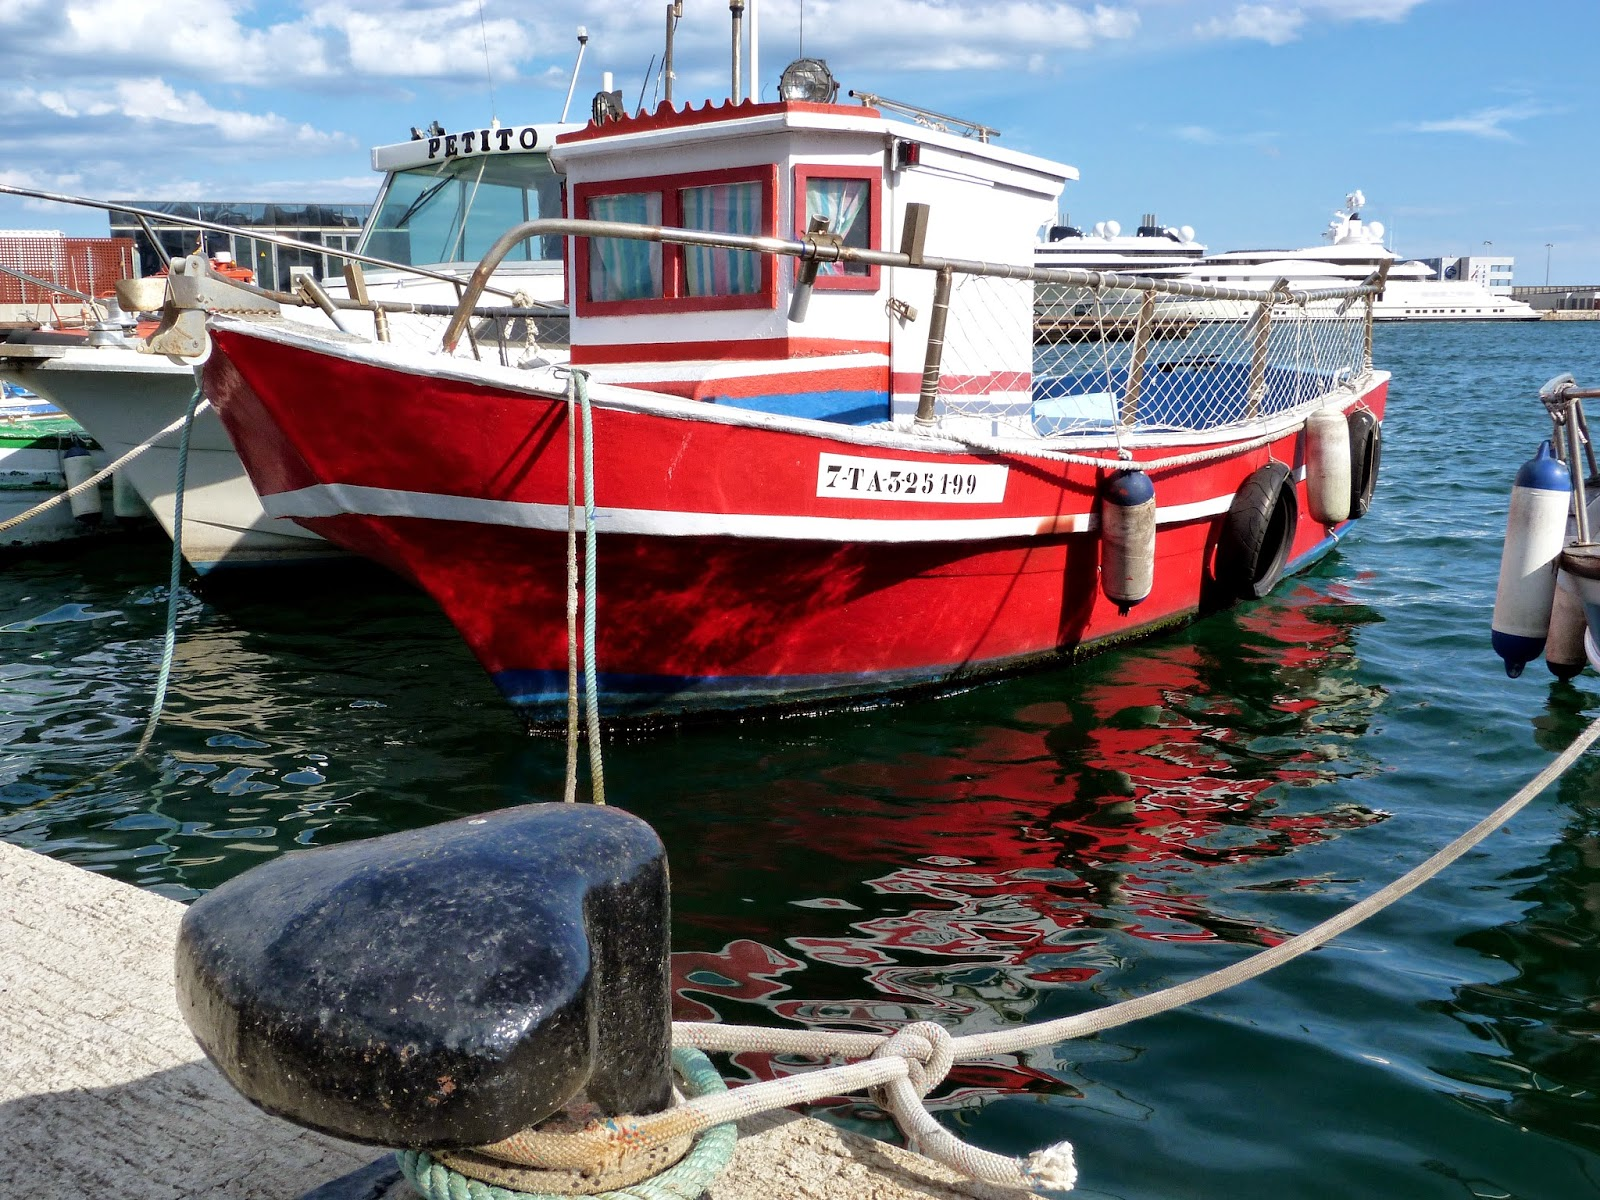 barco de pesca-tarragonain